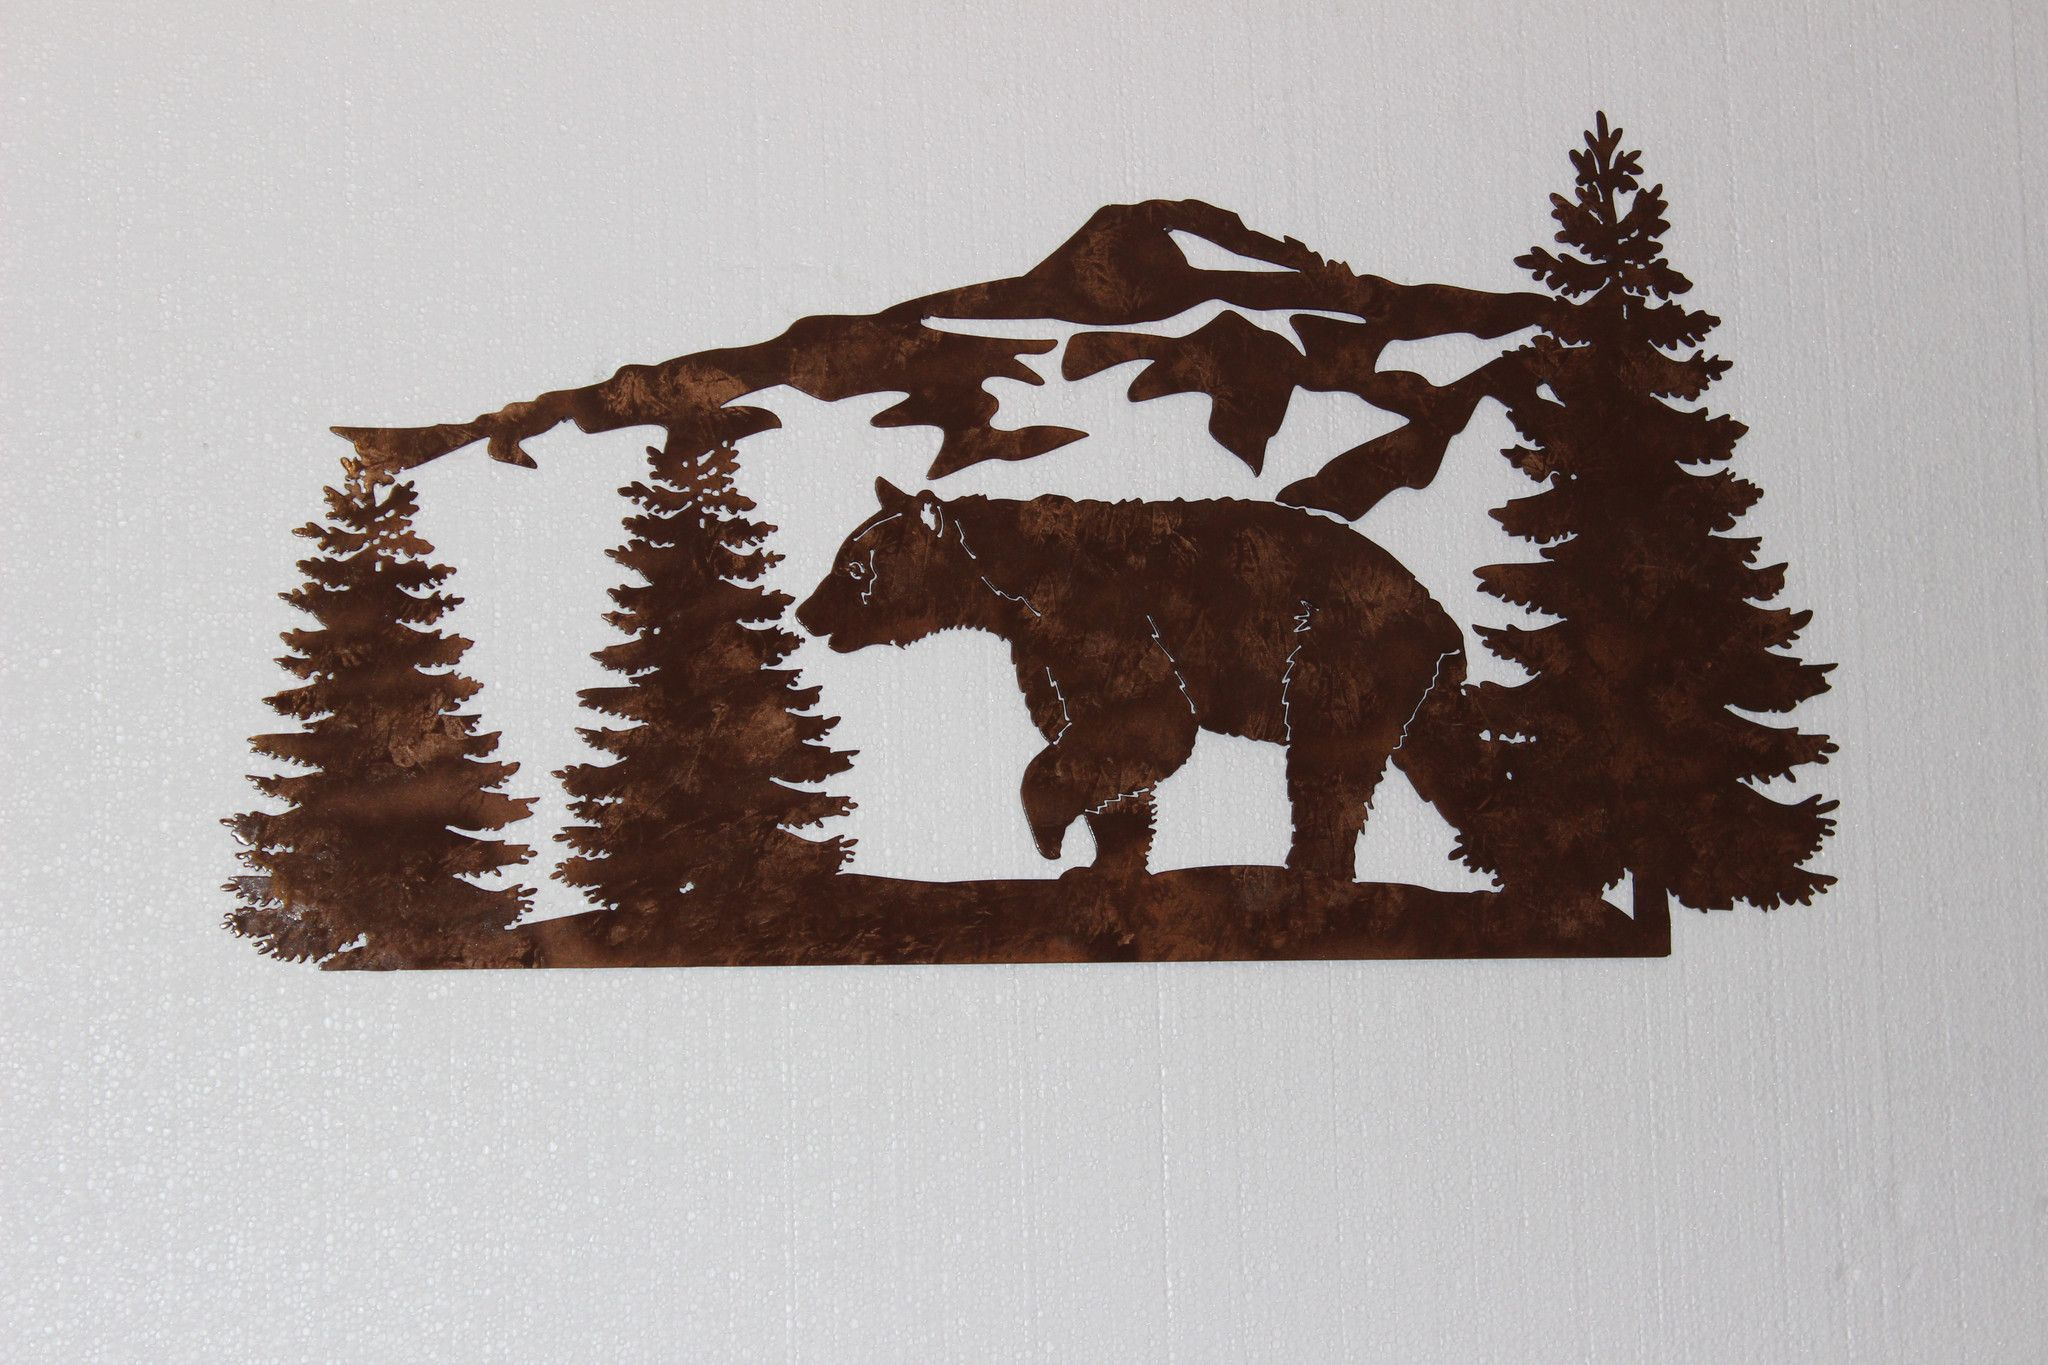 Bear and mountain pine tree scene large metal wall art country